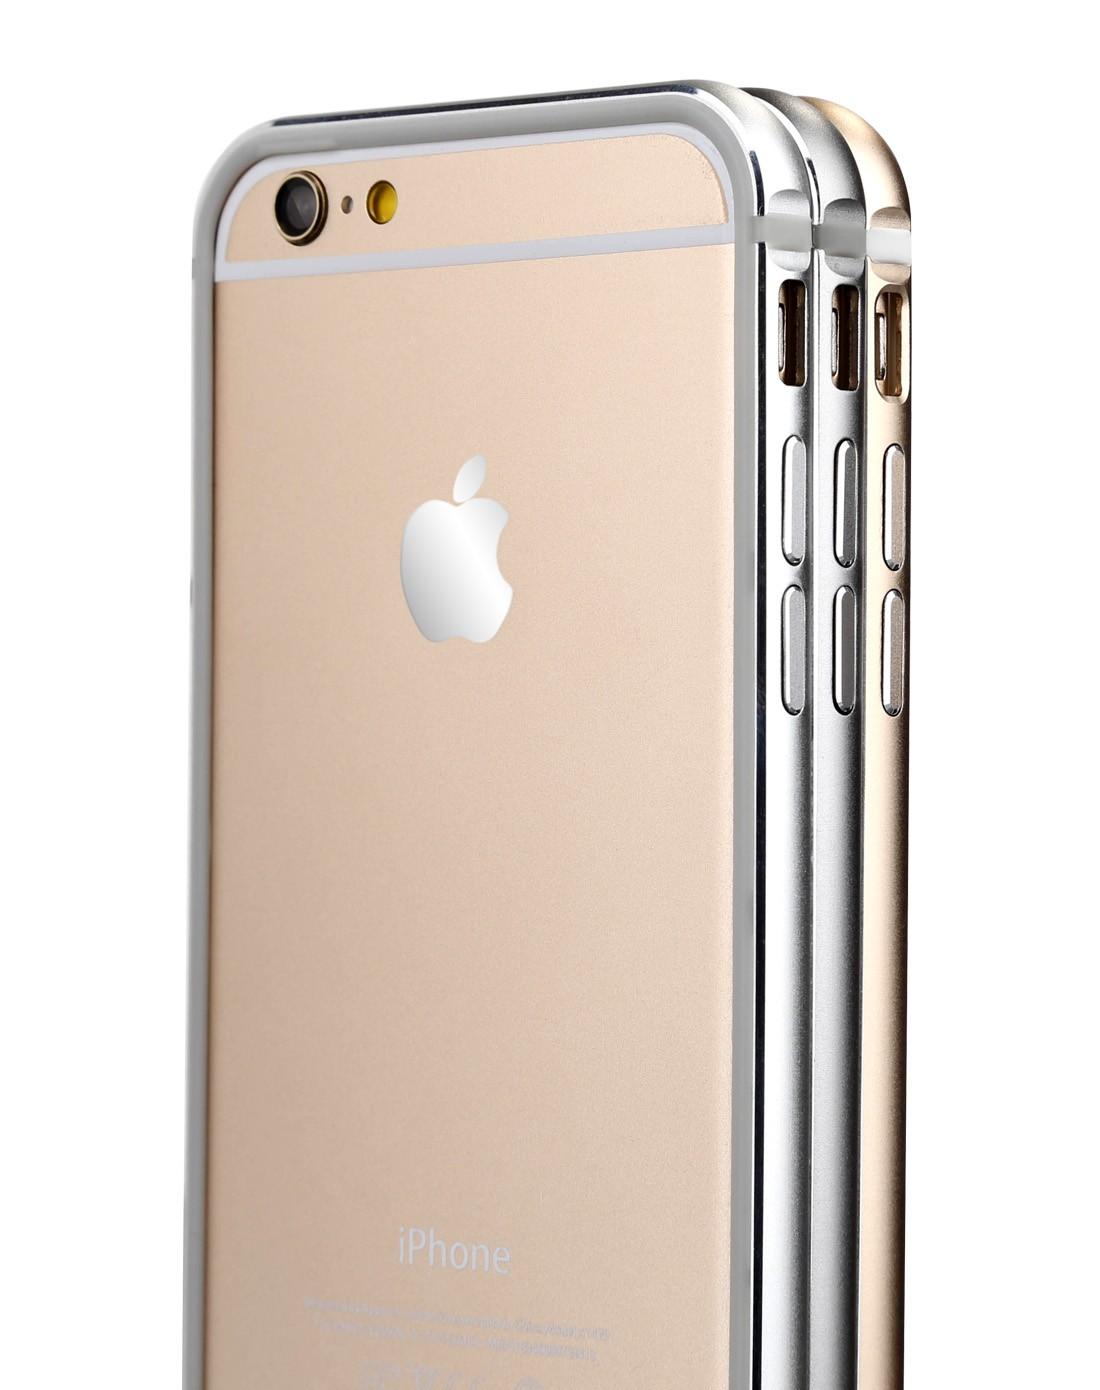 > iphone6/iphone6s灰色边框内套tpu边框